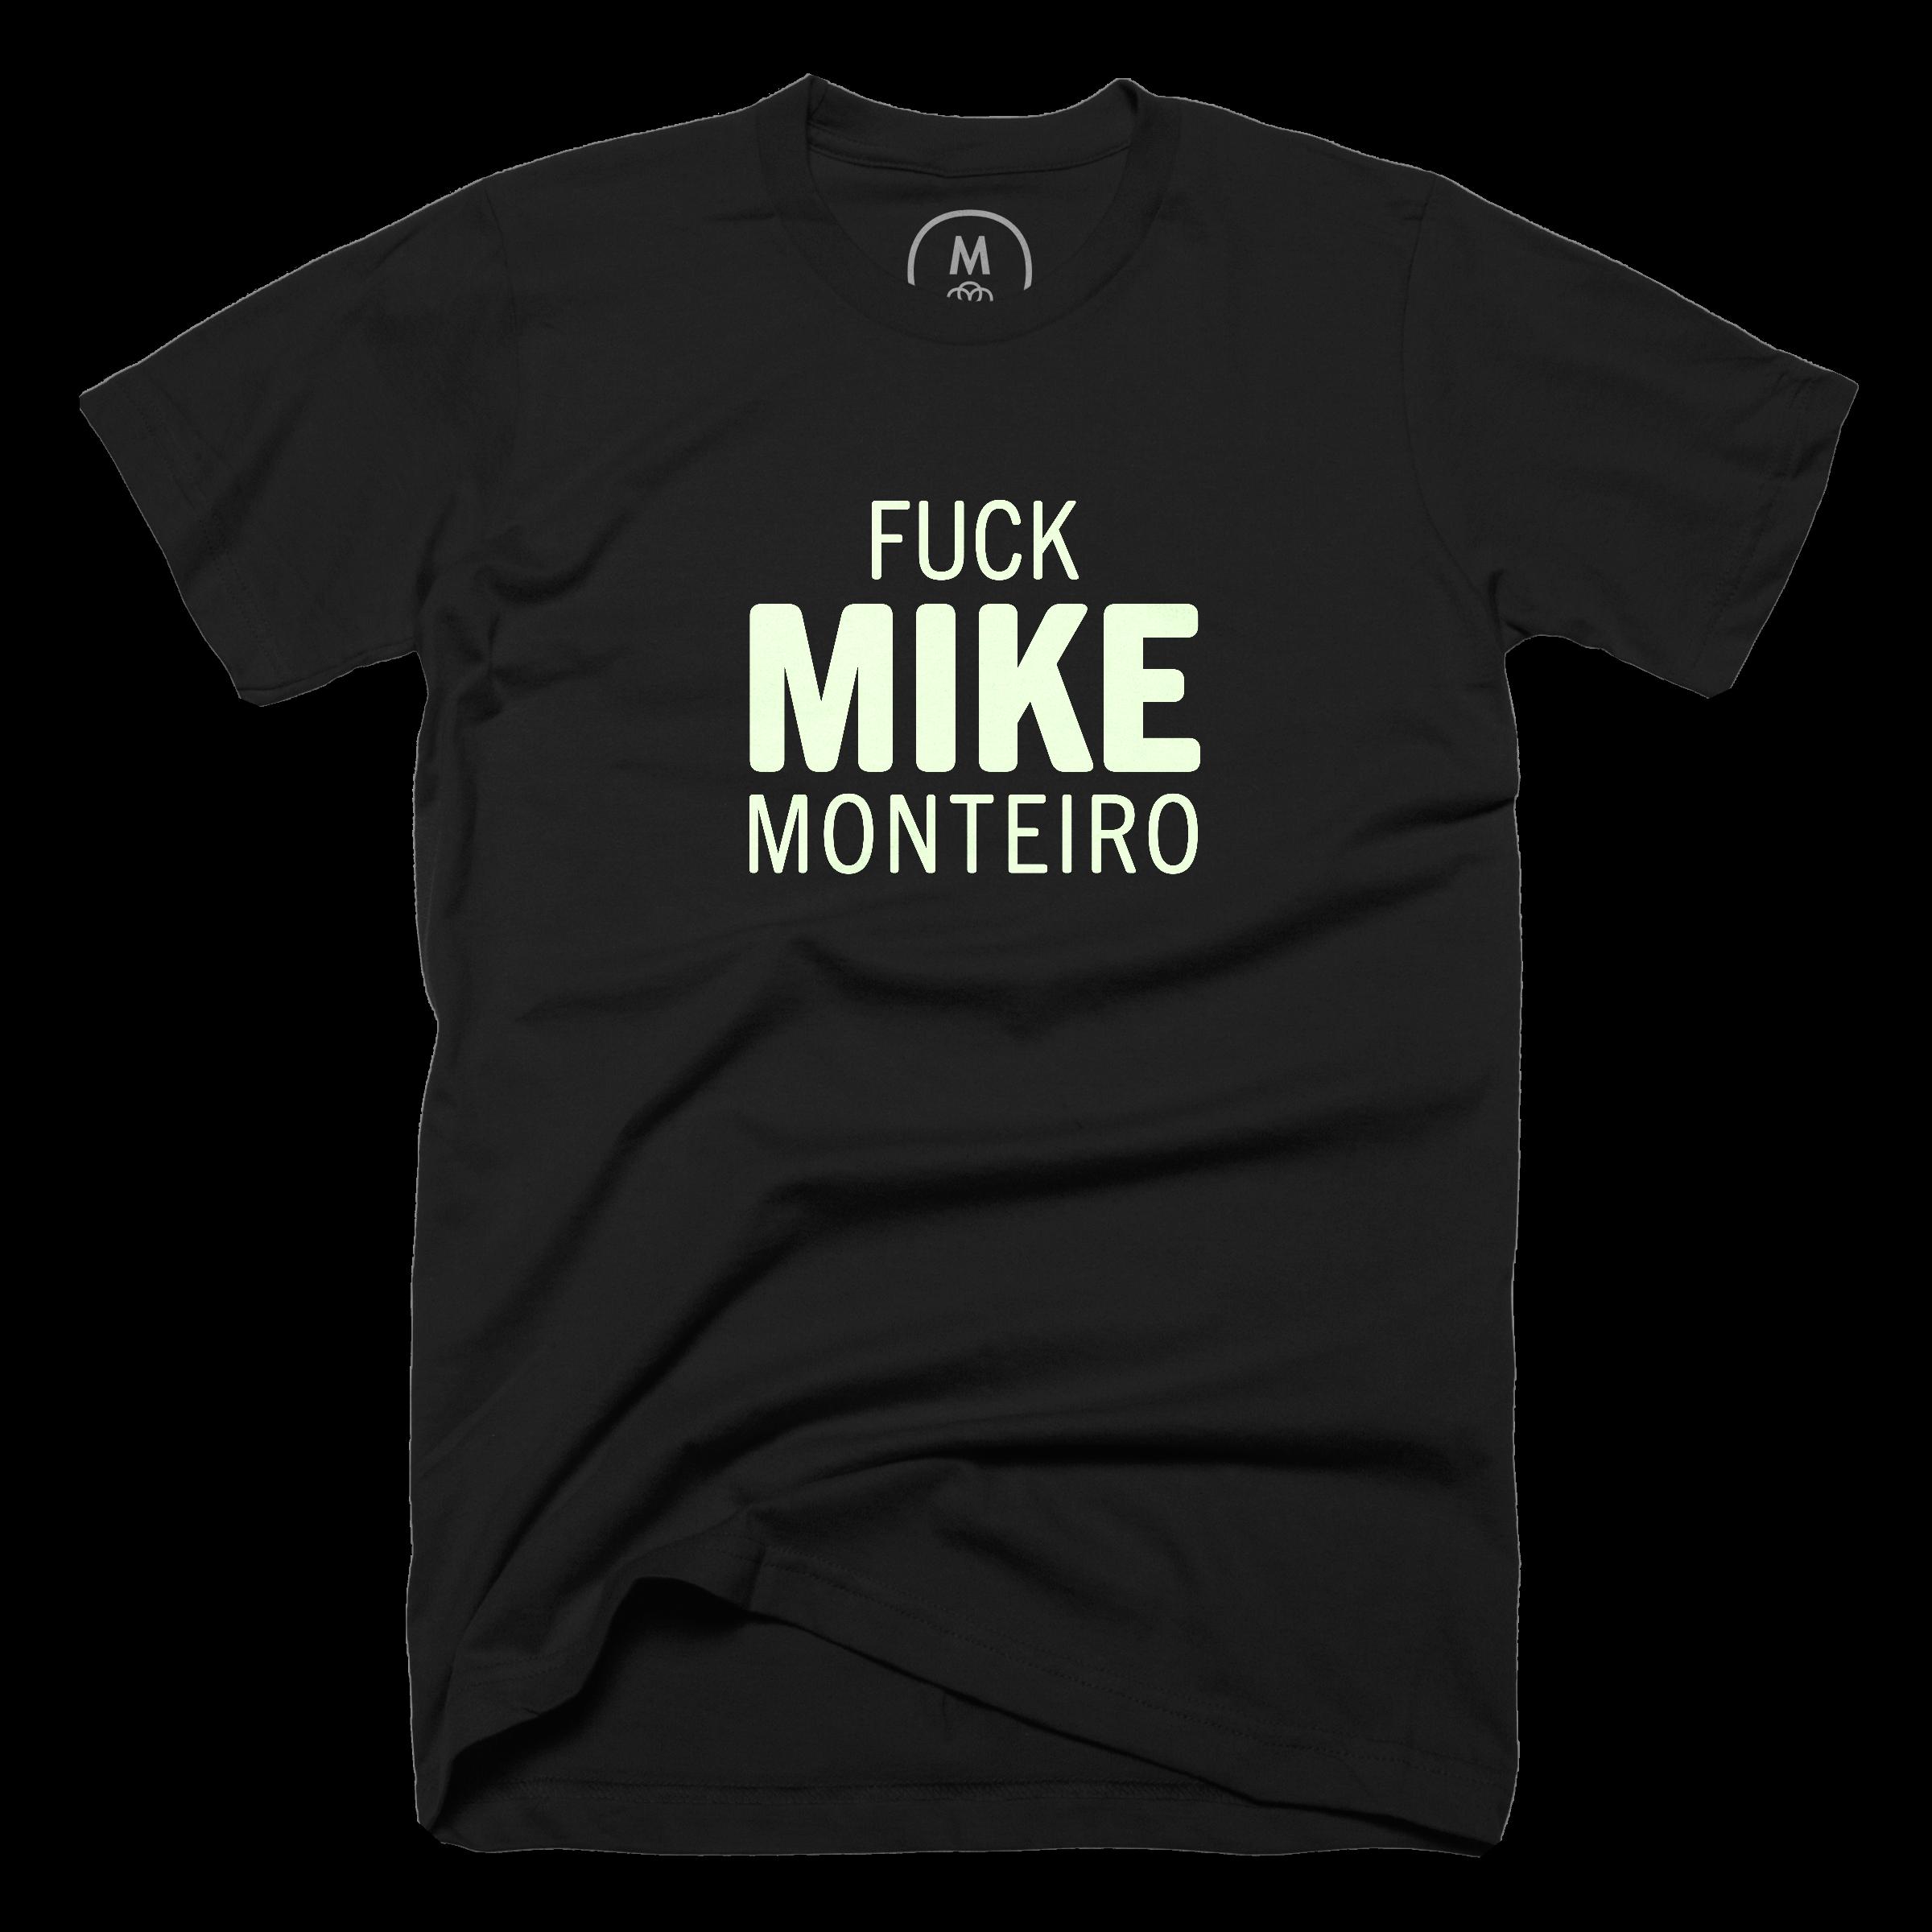 Fuck Mike Monteiro